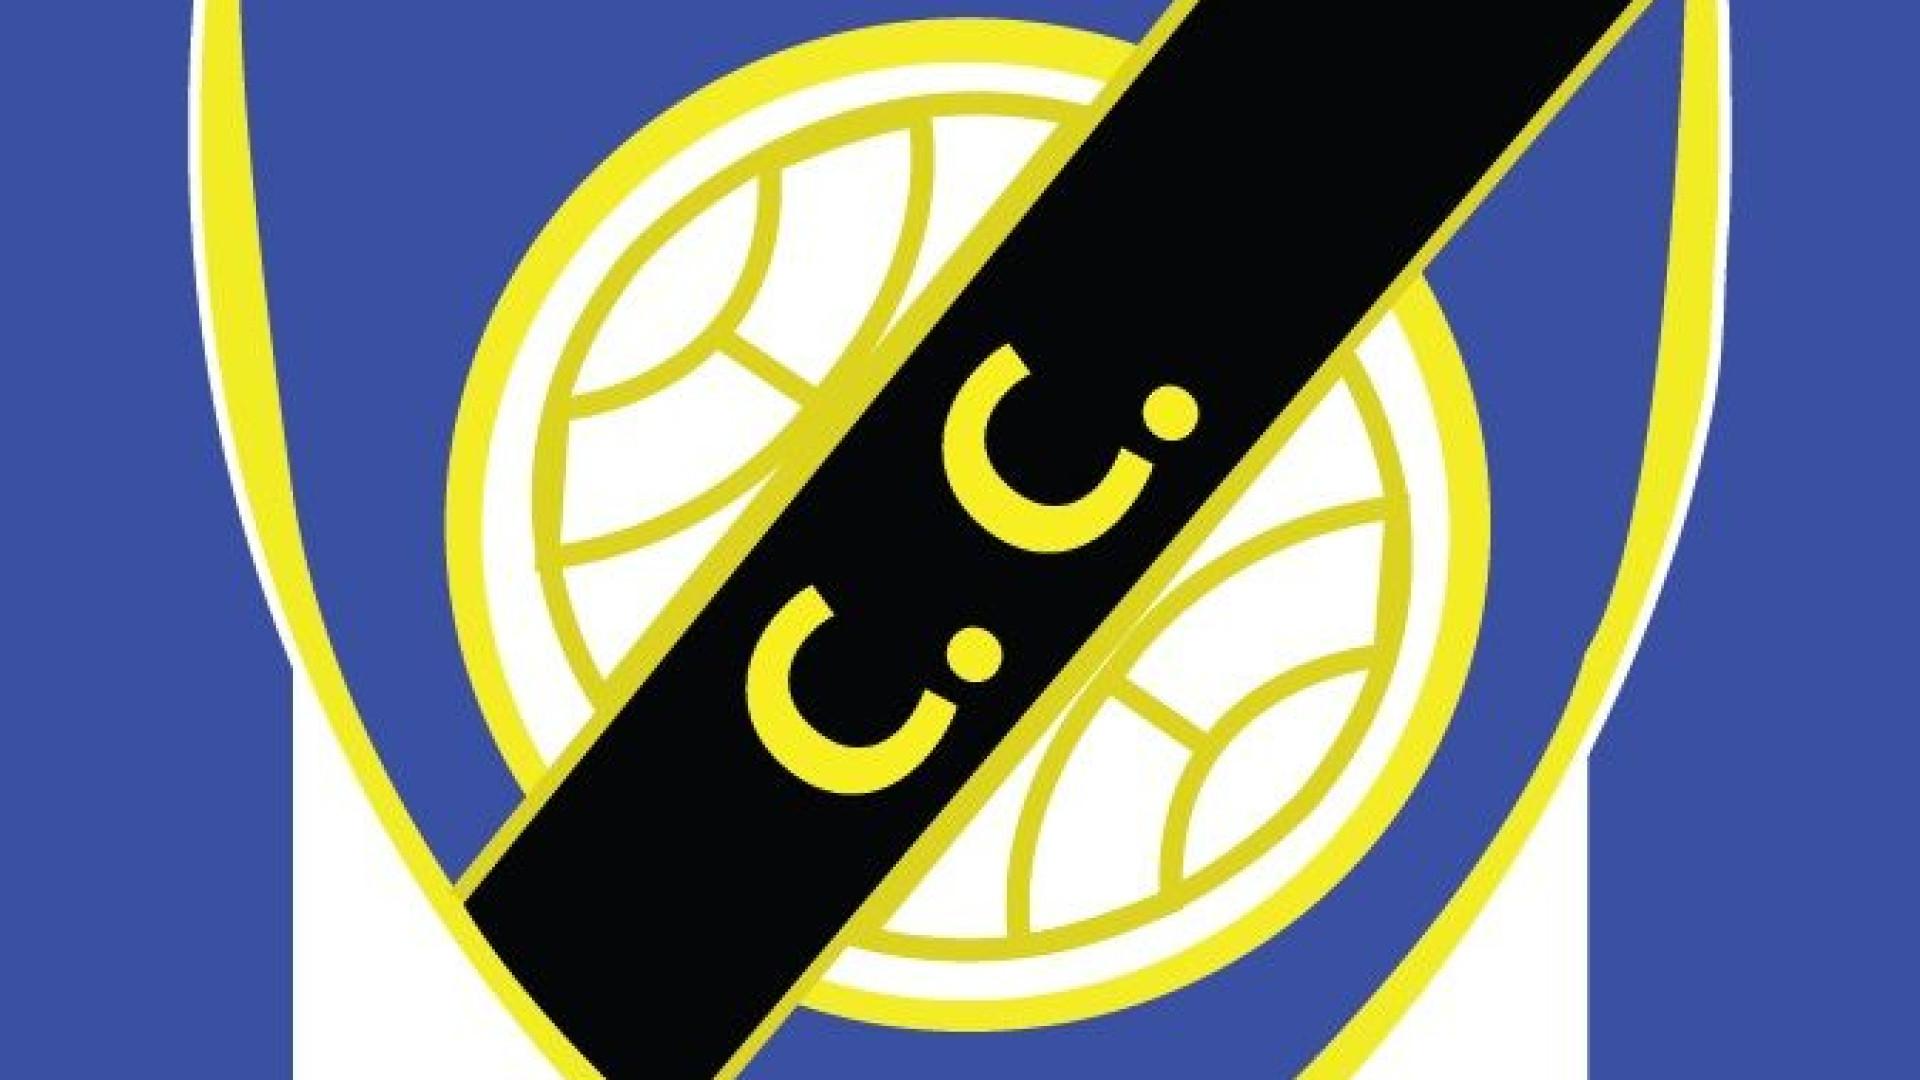 Carnide Clube pode ser classificado como entidade de interesse histórico